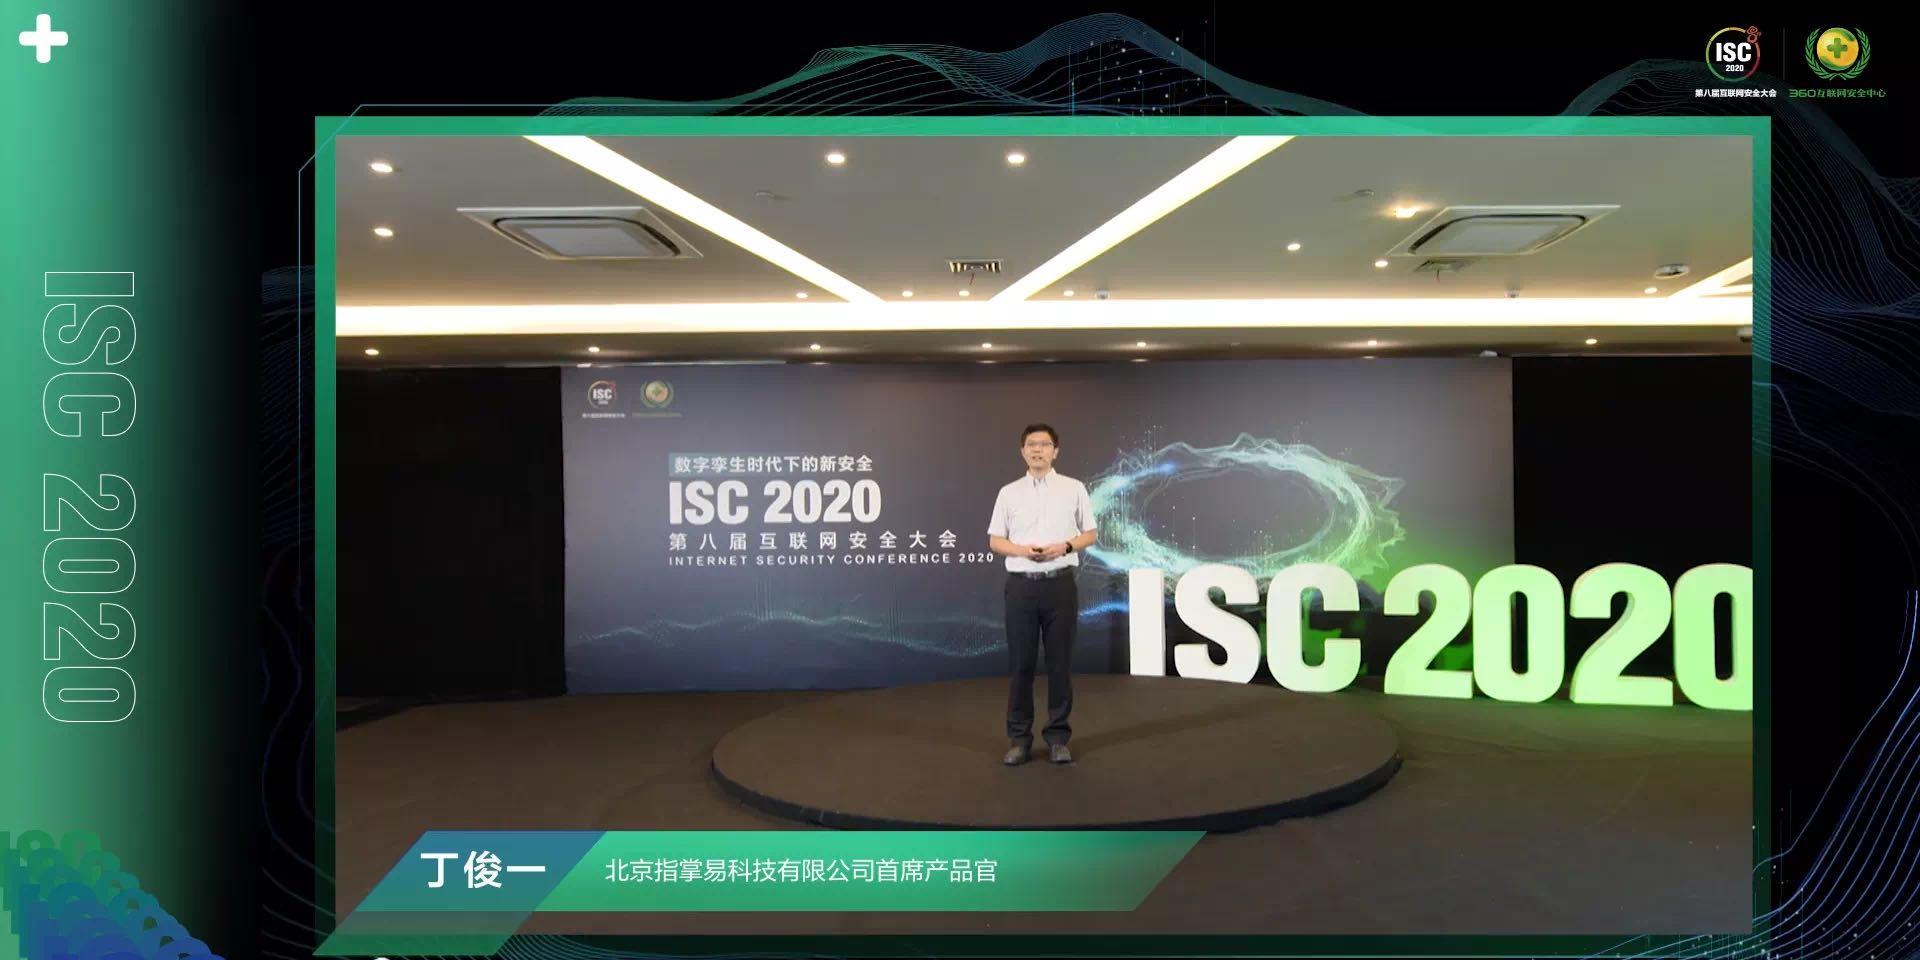 ISC 2020 大数据产业安全创新在线研讨会丨丁俊一:移动互联时代,网络安全和业务赋能的关系